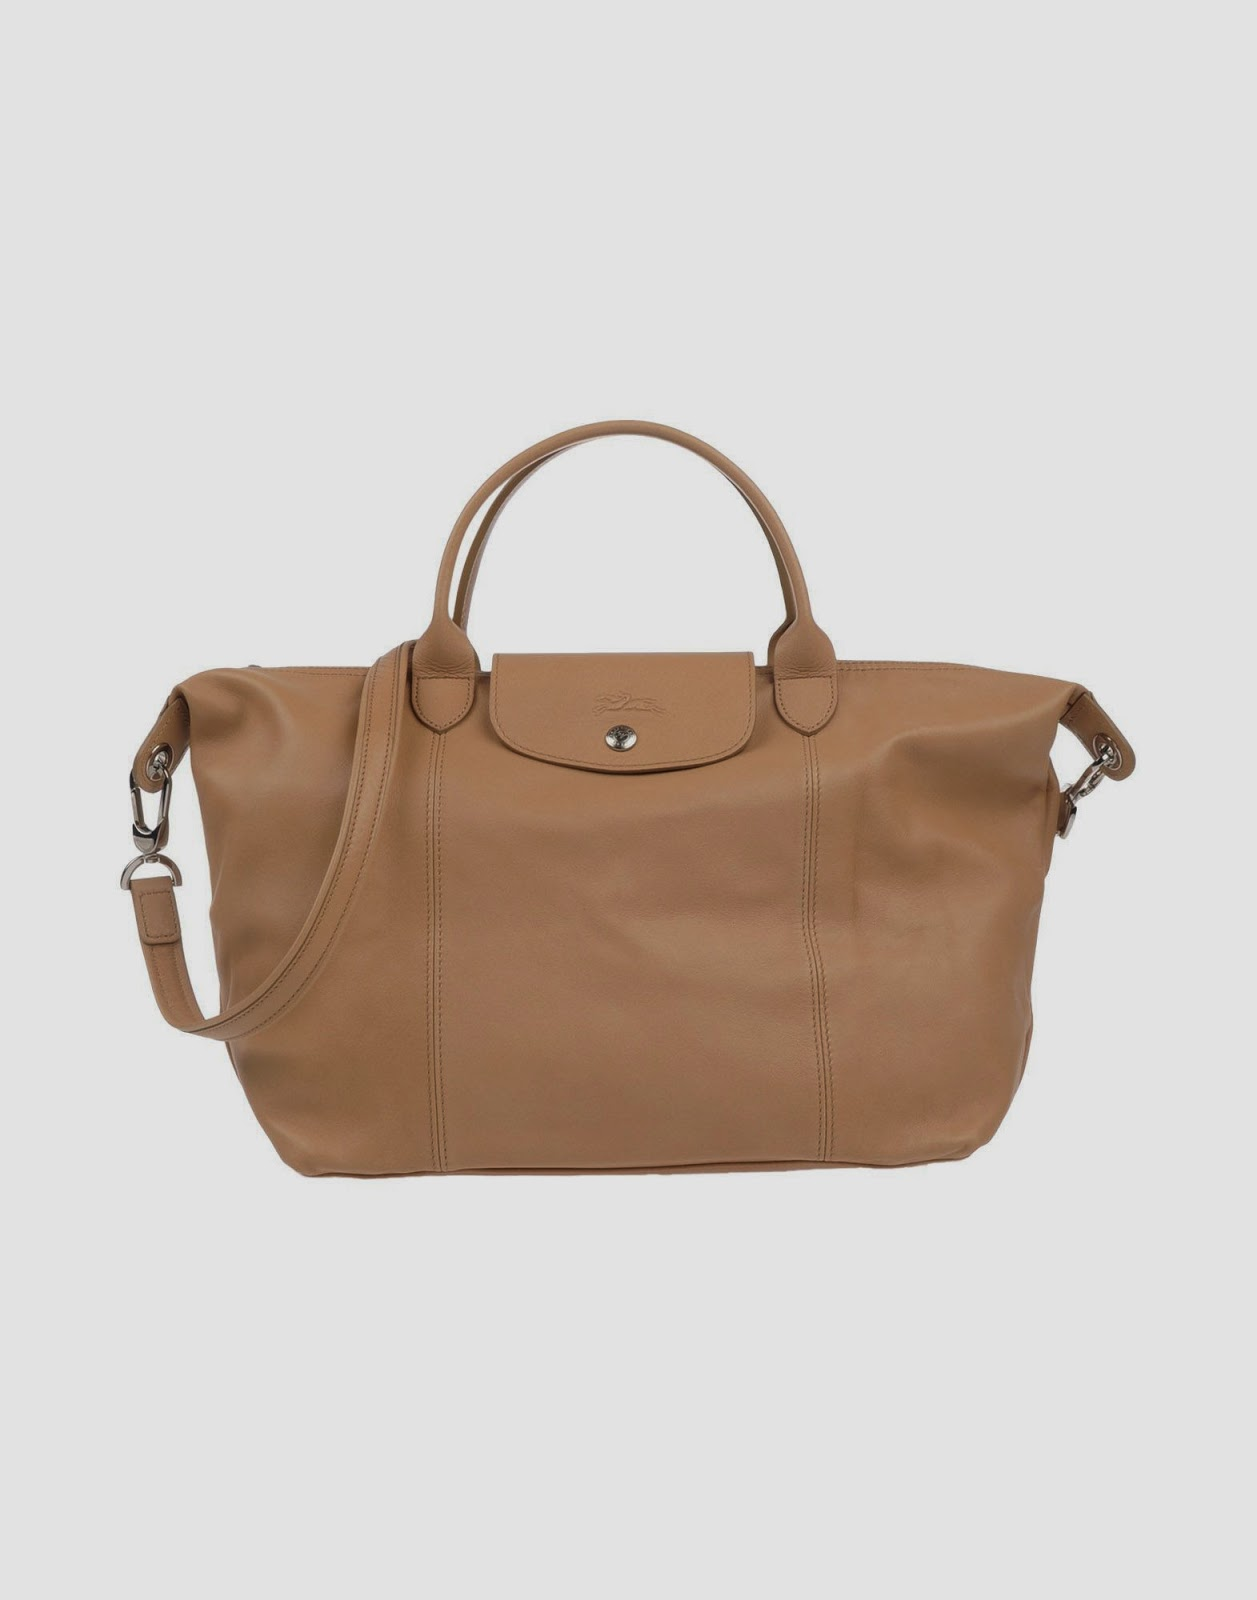 Big Longchamp Bag to stuff!